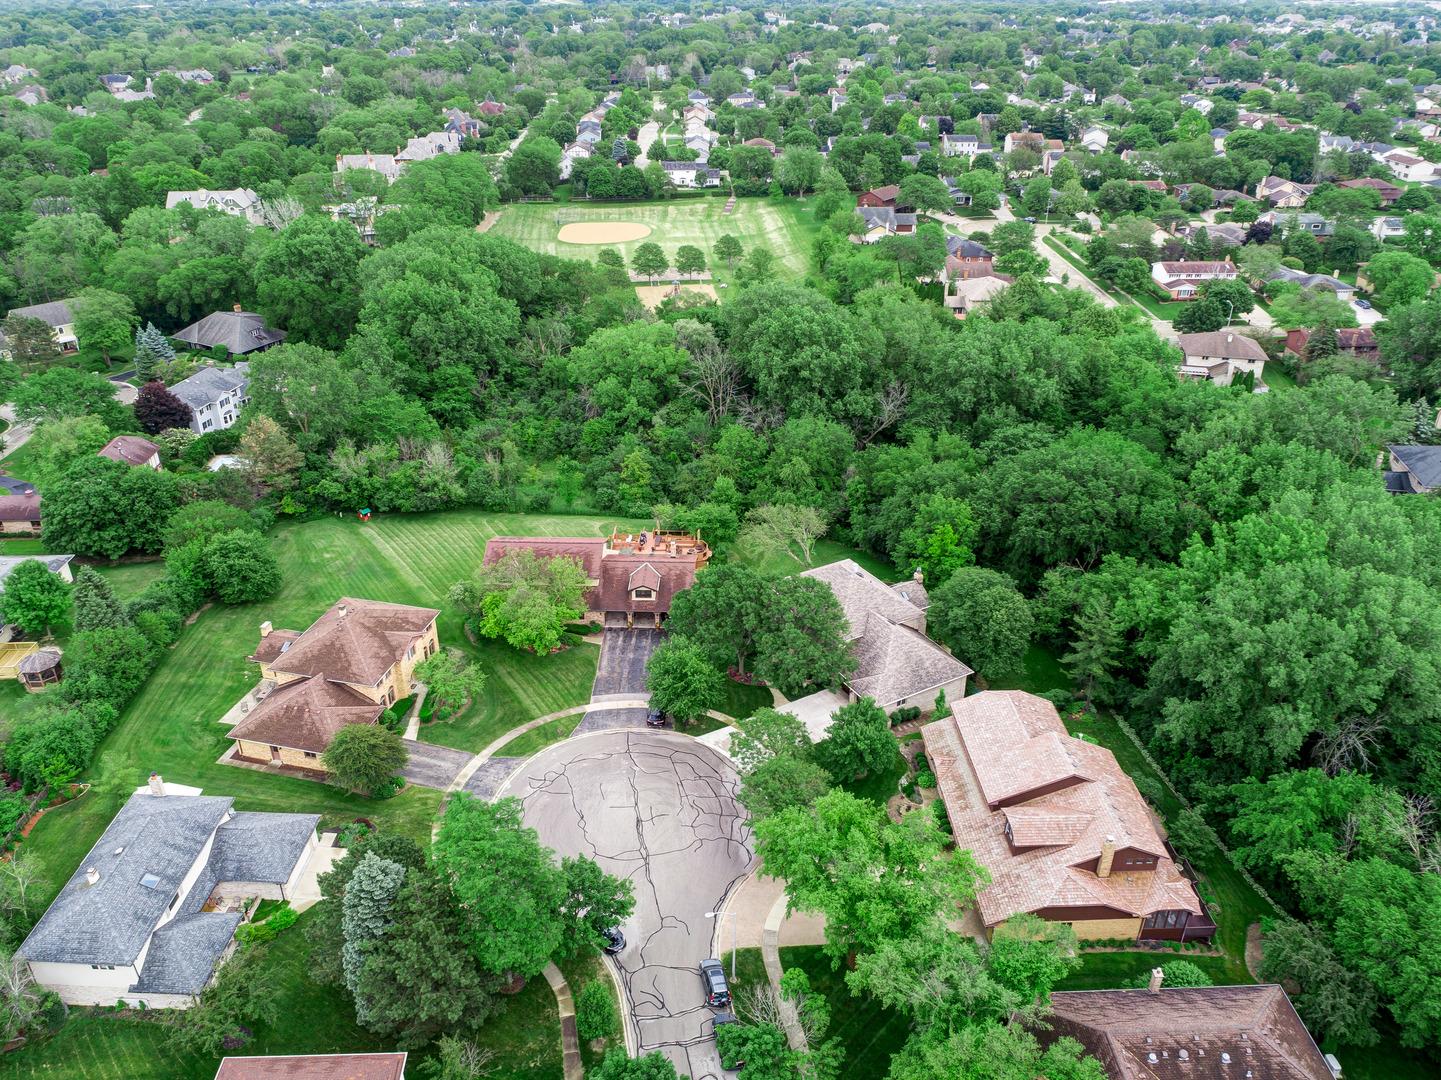 421 Creekside, WILLOWBROOK, Illinois, 60527